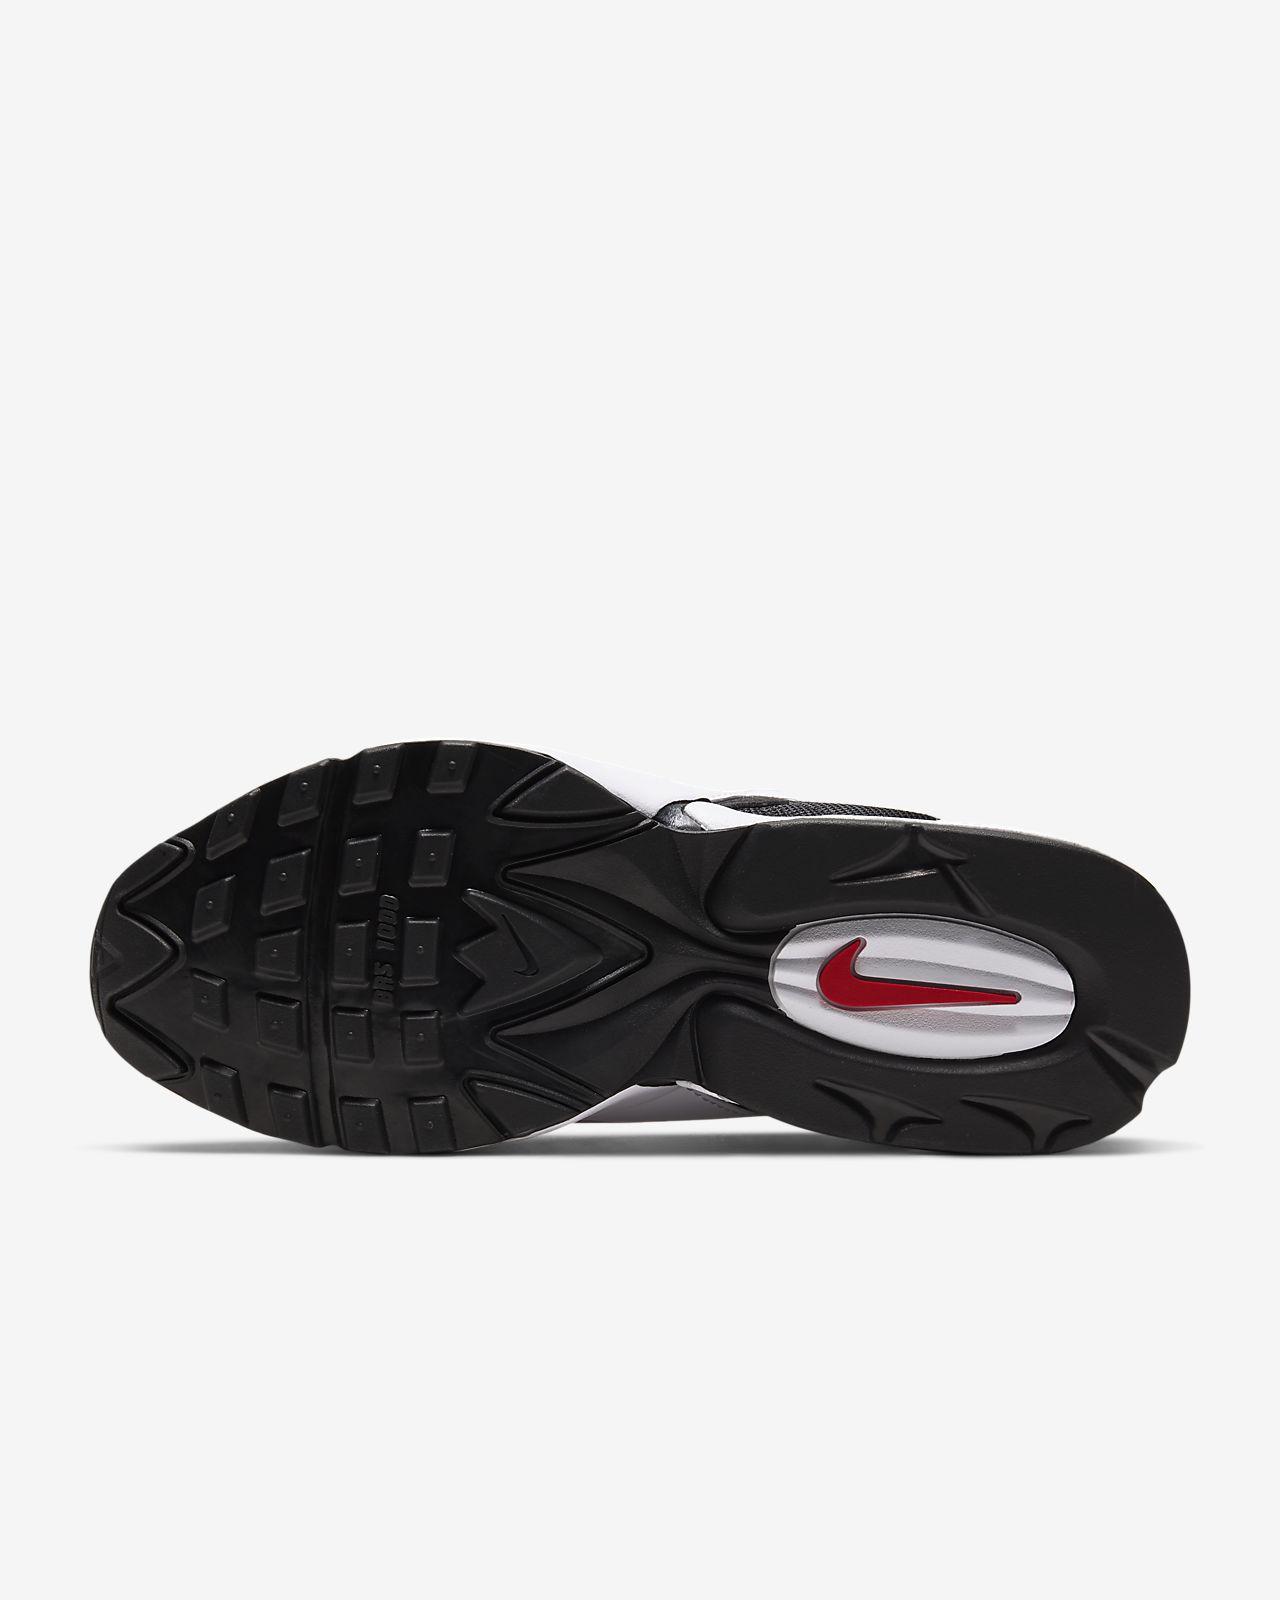 Nike Air Max Tailwind 96 12 'WhiteDark Grey Sport Red